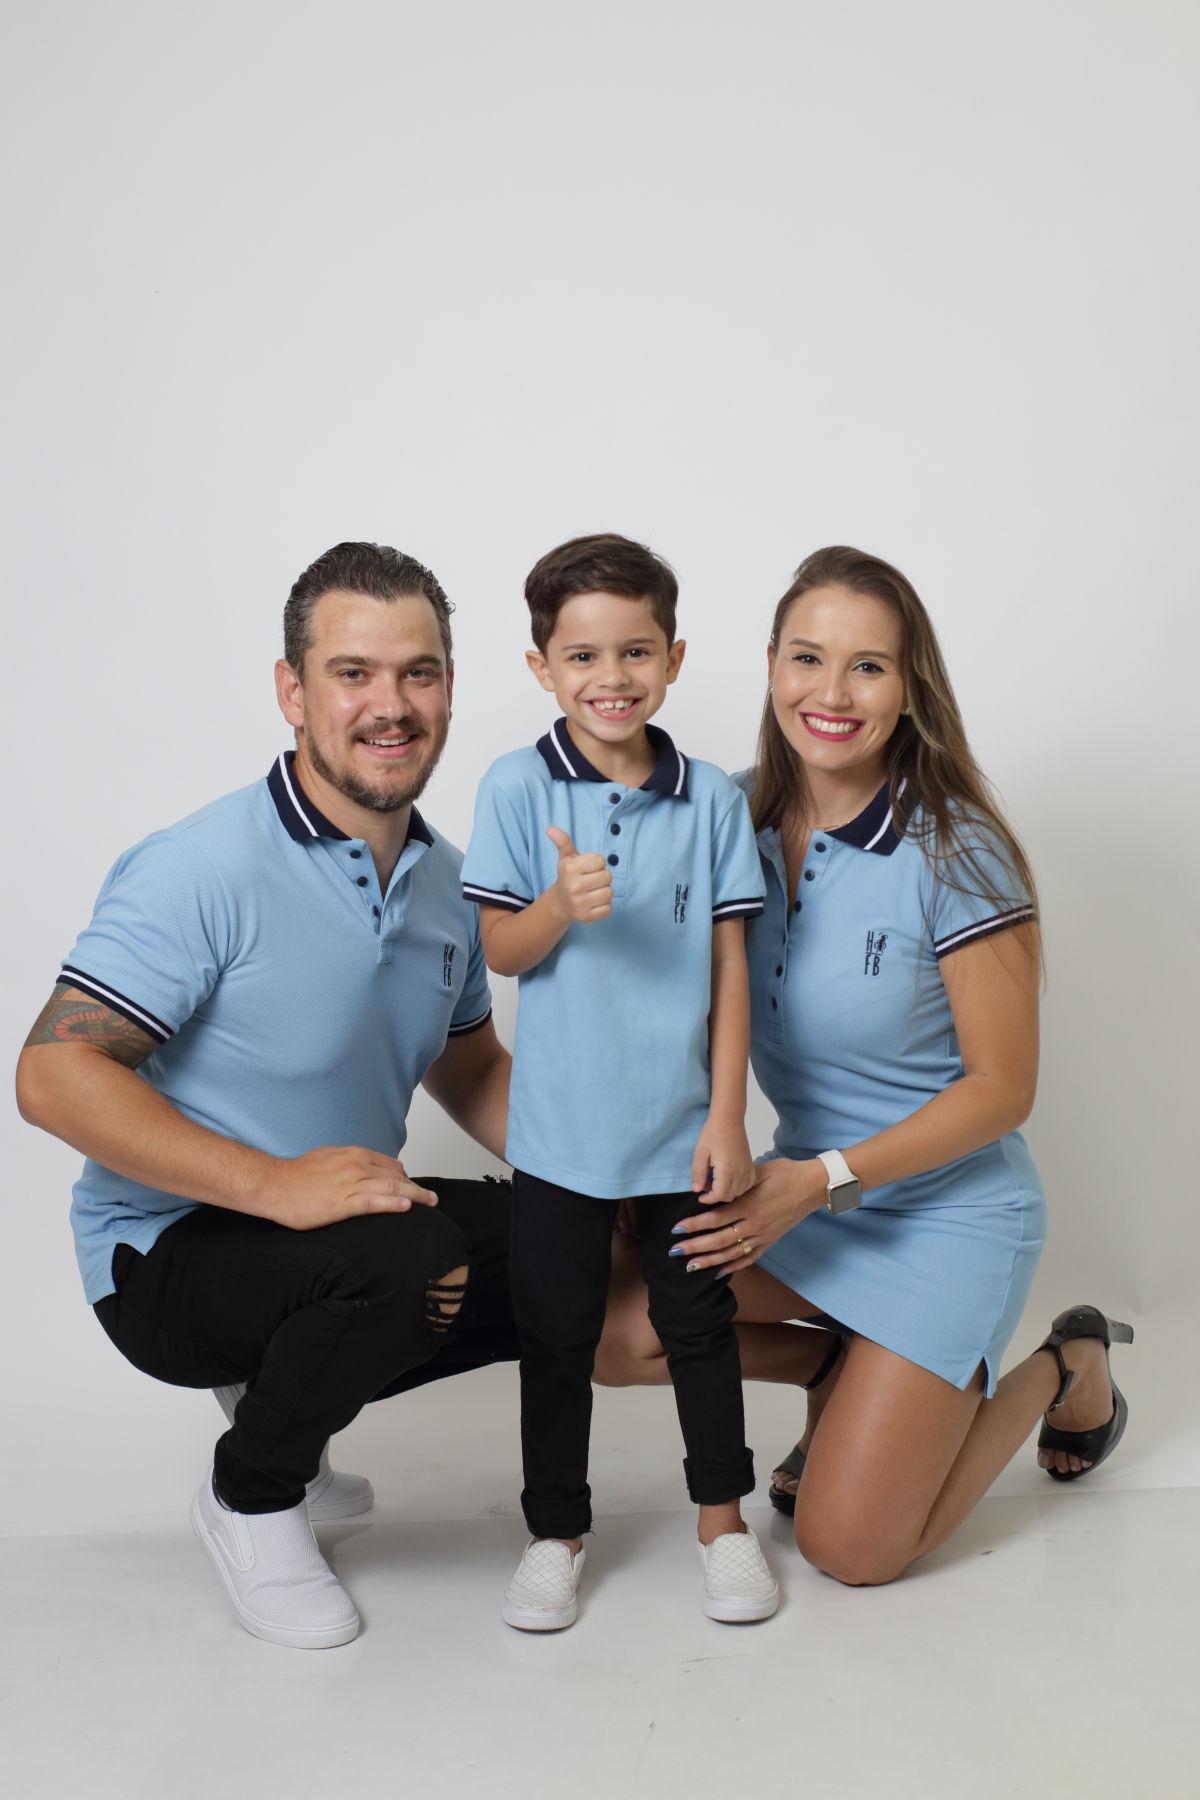 PAIS E FILHOS > Kit 3 peças Camisas ou Body Polo e Vestido Azul Nobreza